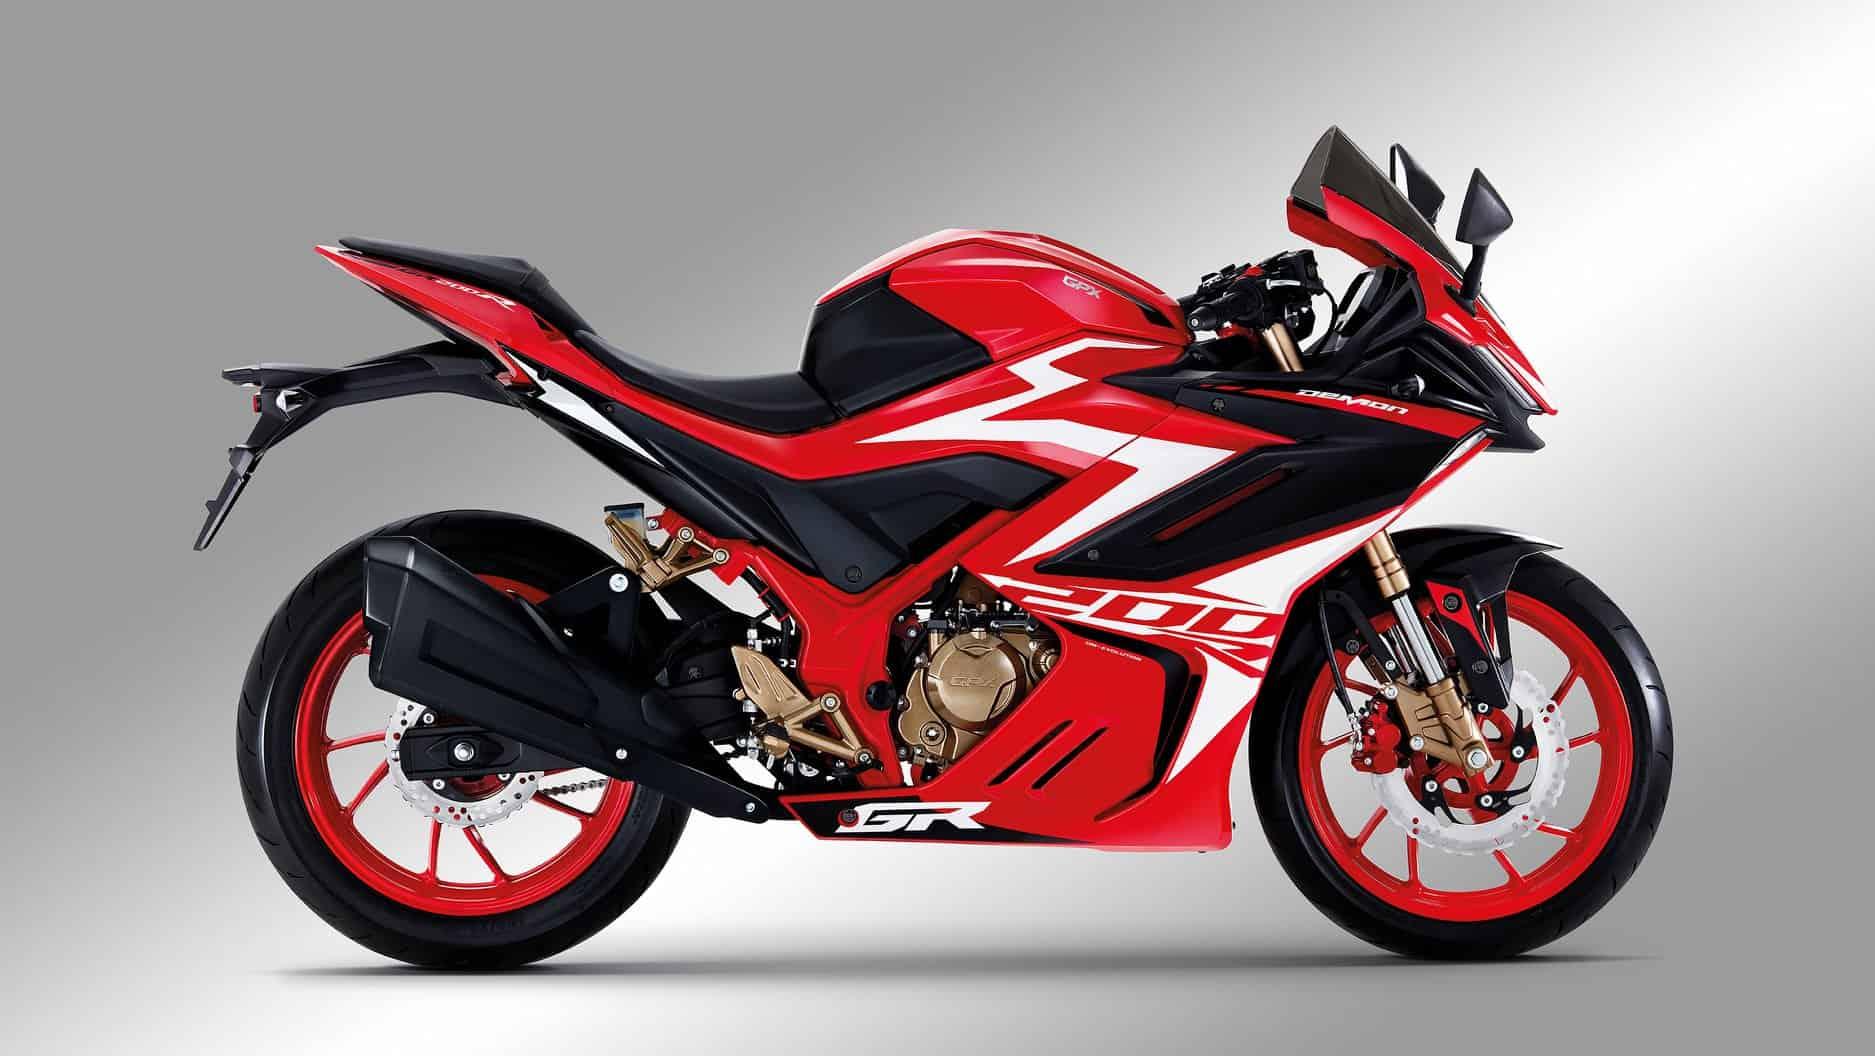 GR200R màu Đỏ